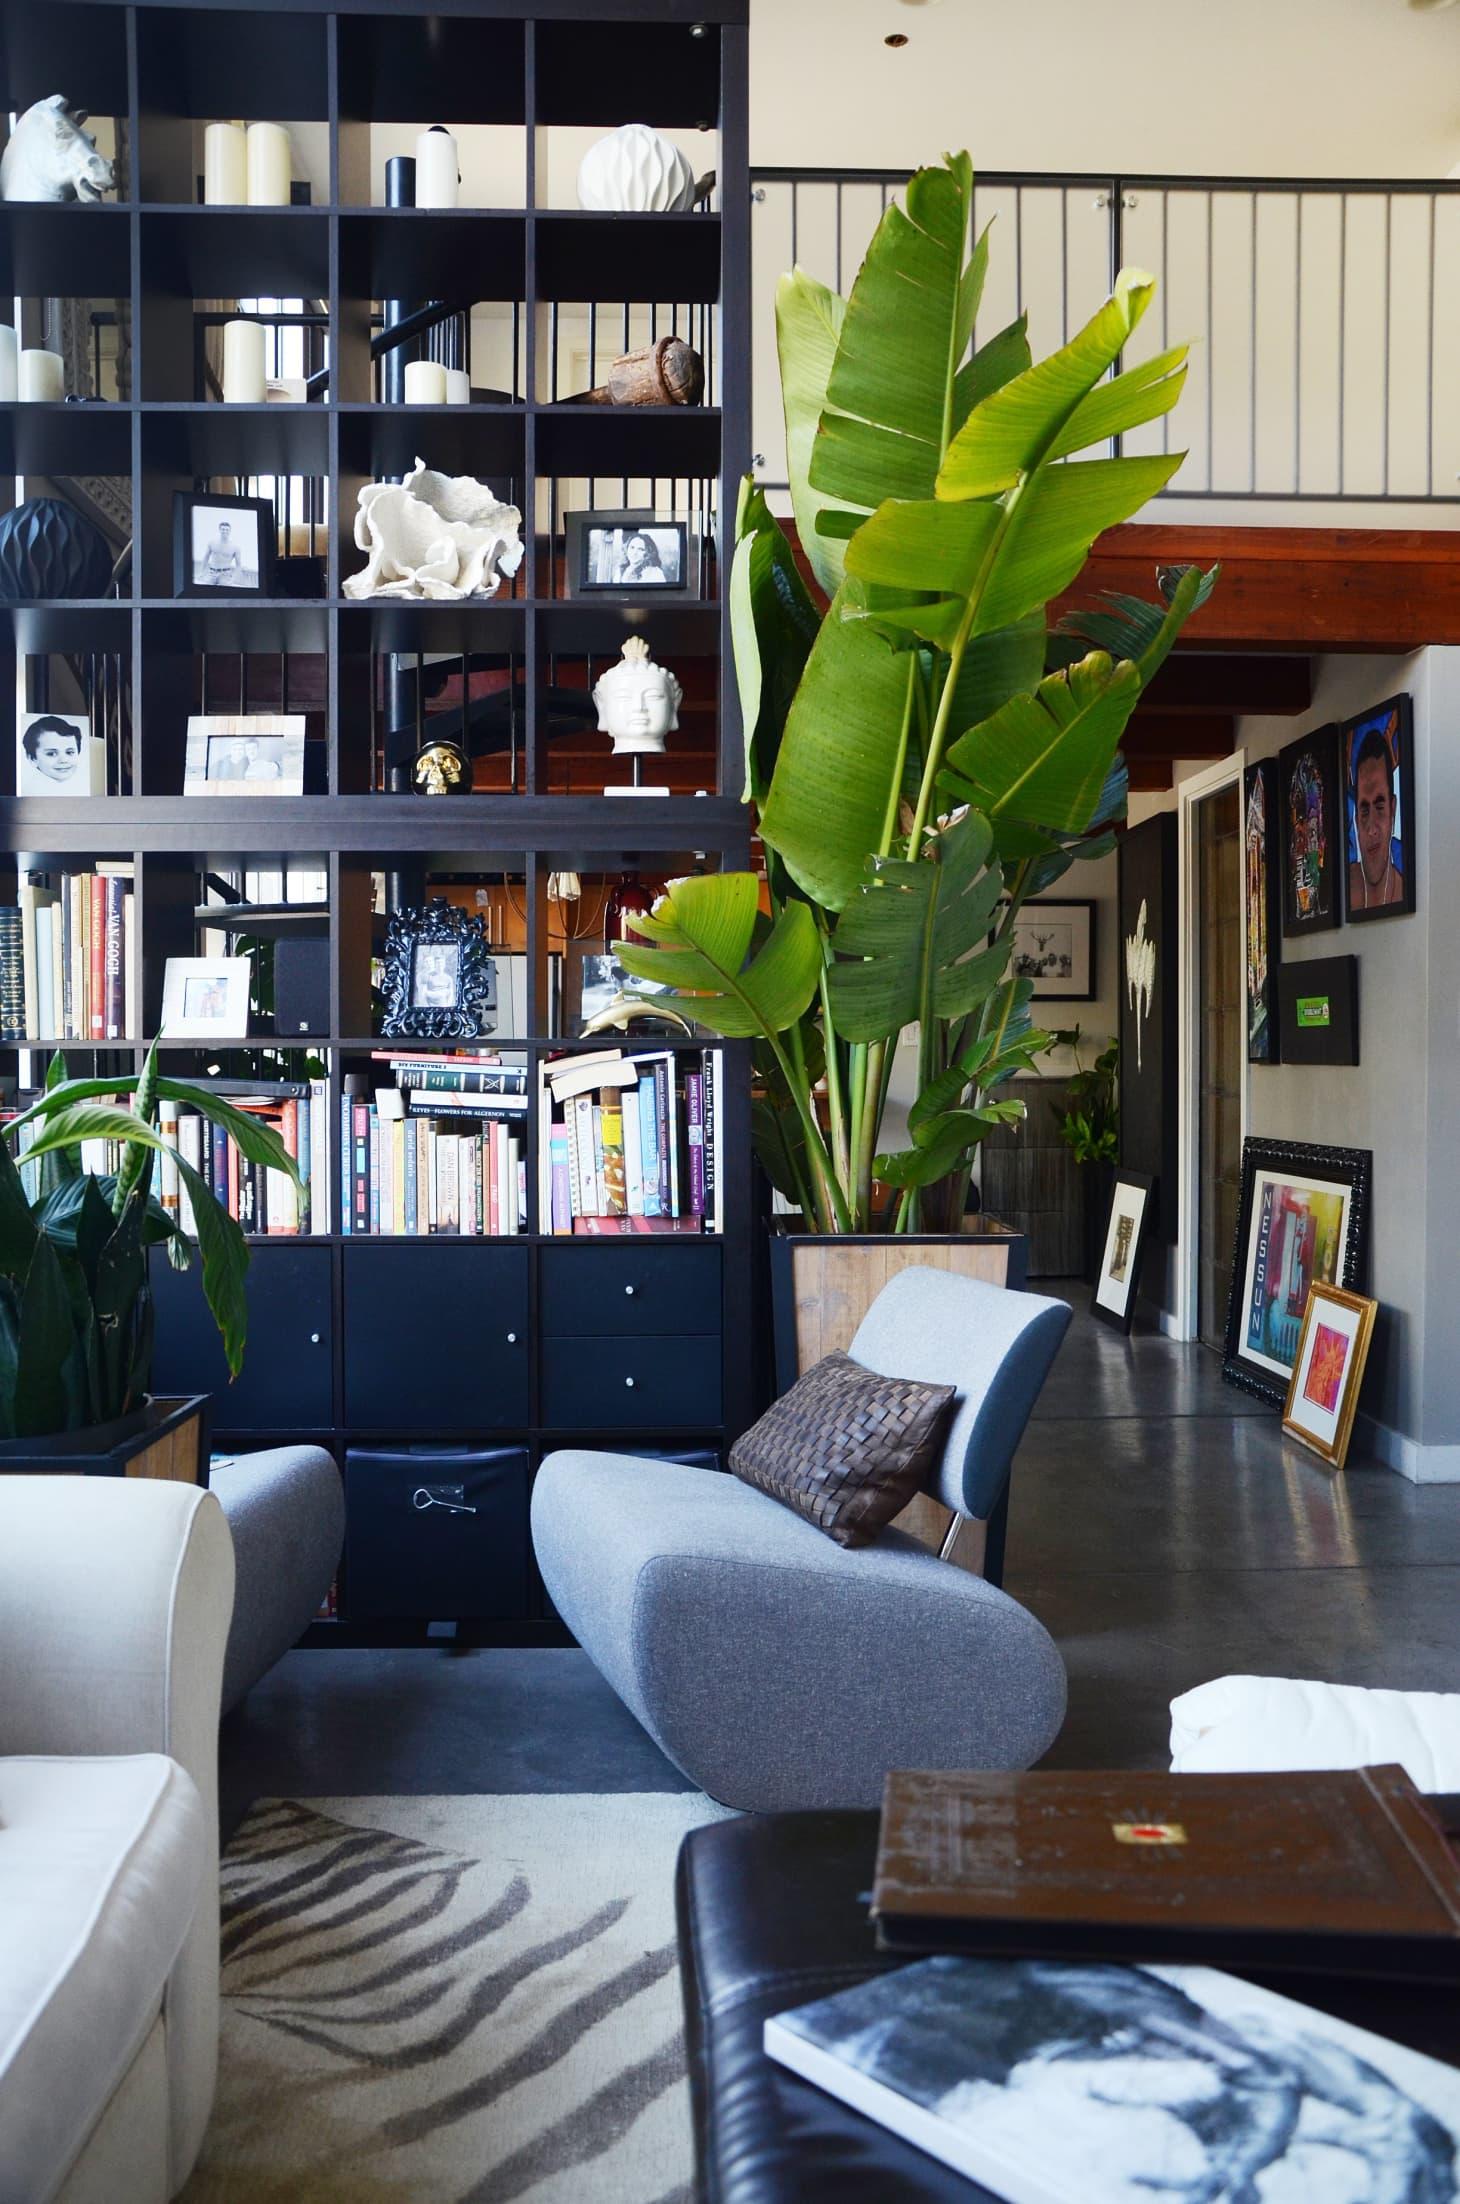 House Tour: A Creative San Francisco Loft & Coffee Shop ...